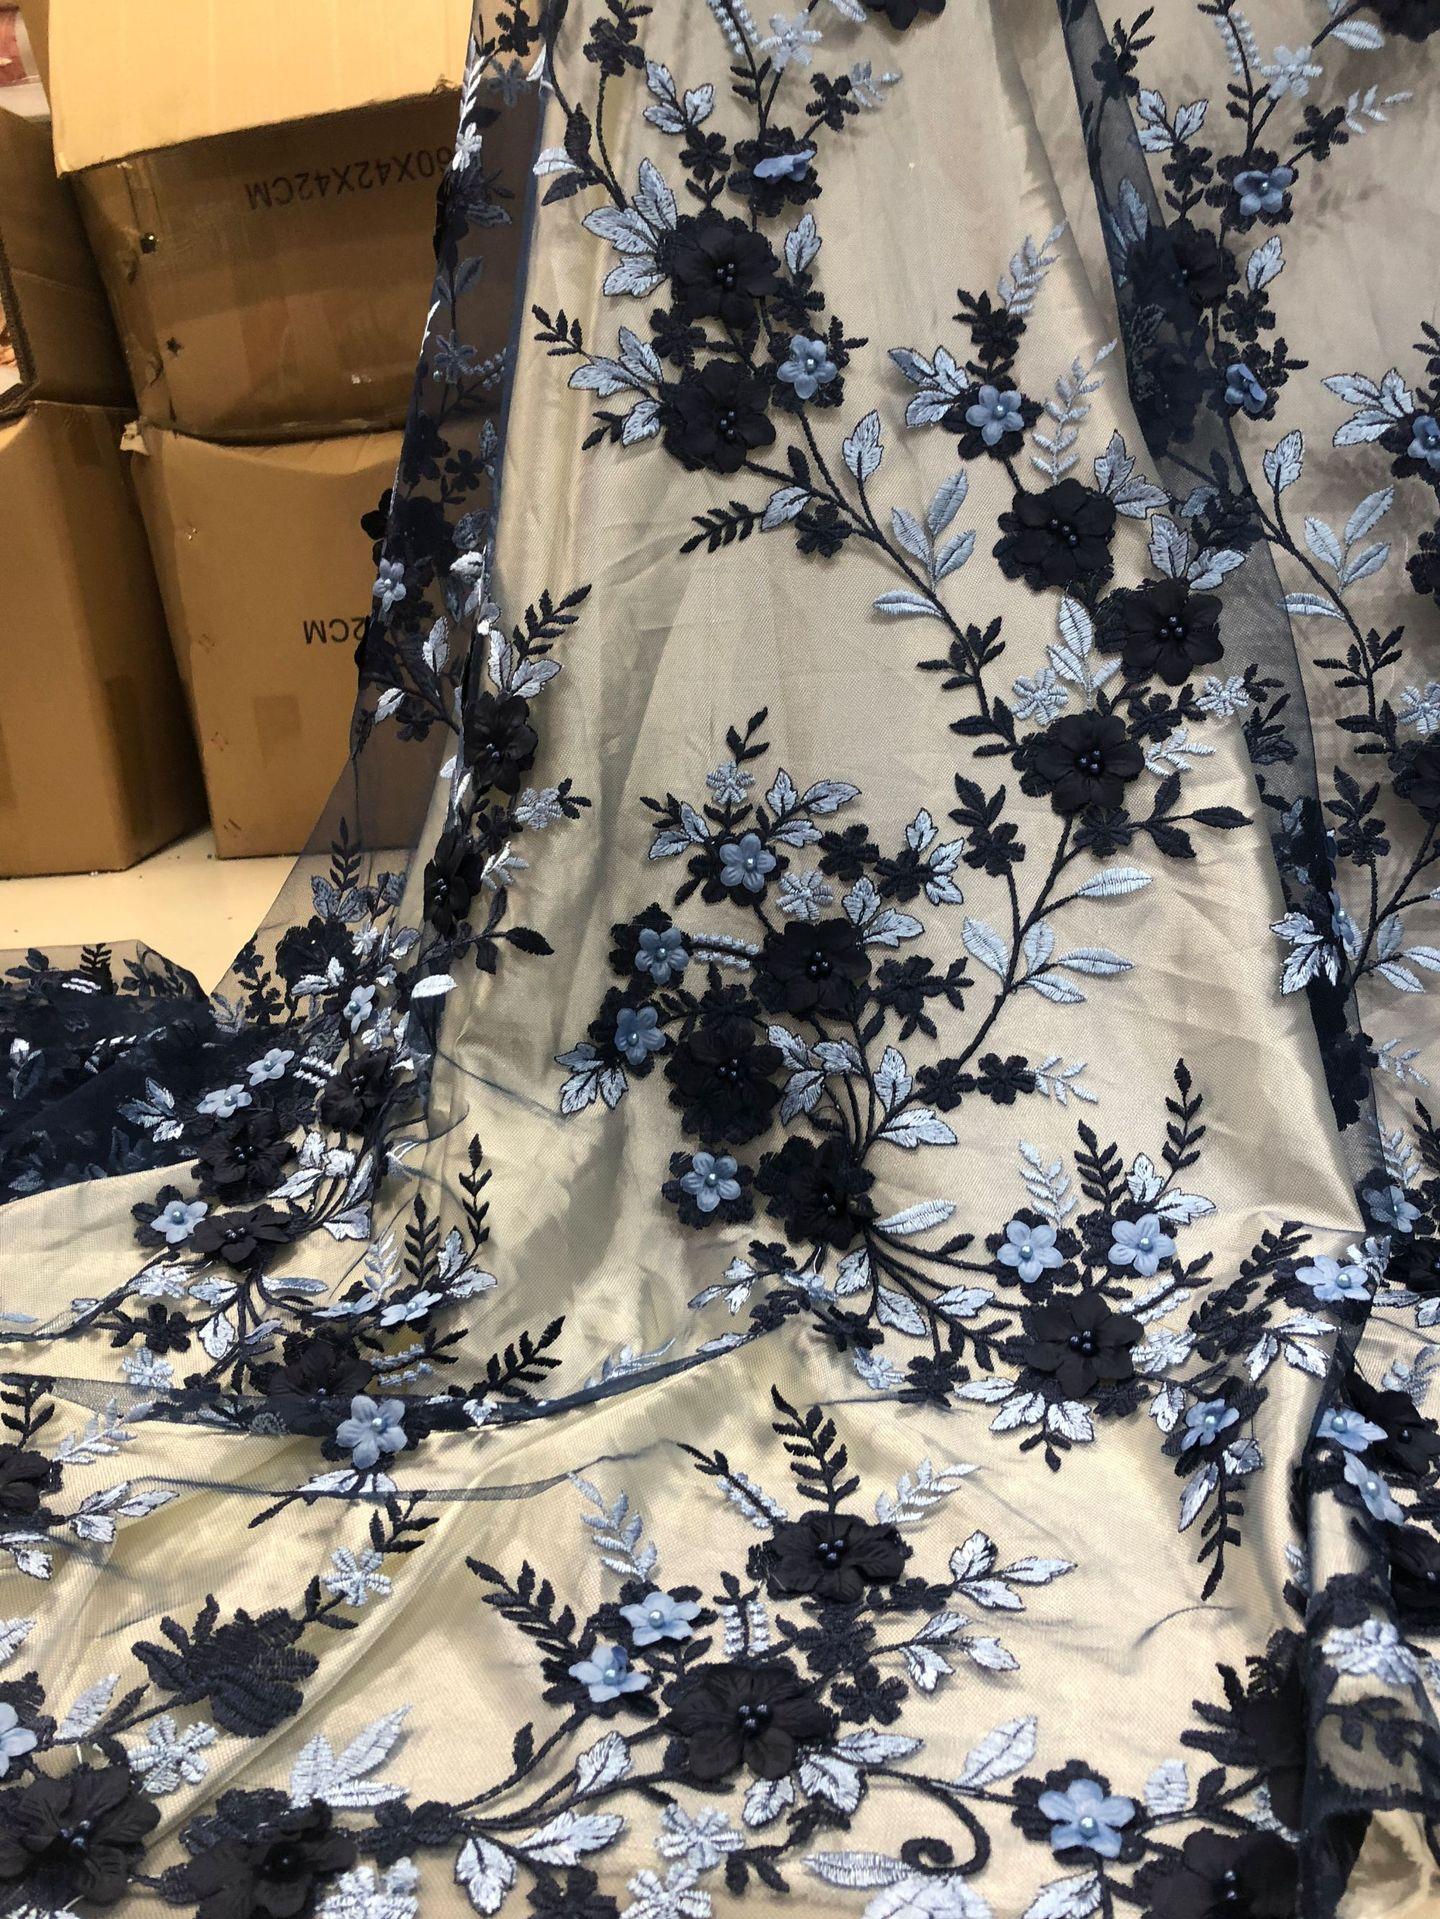 Nouveau 3D broderie robe de mariée tissu dîner robe formelle perles brodé dentelle tissu dentelle ruban dernière dentelle tissu dentelle garniture